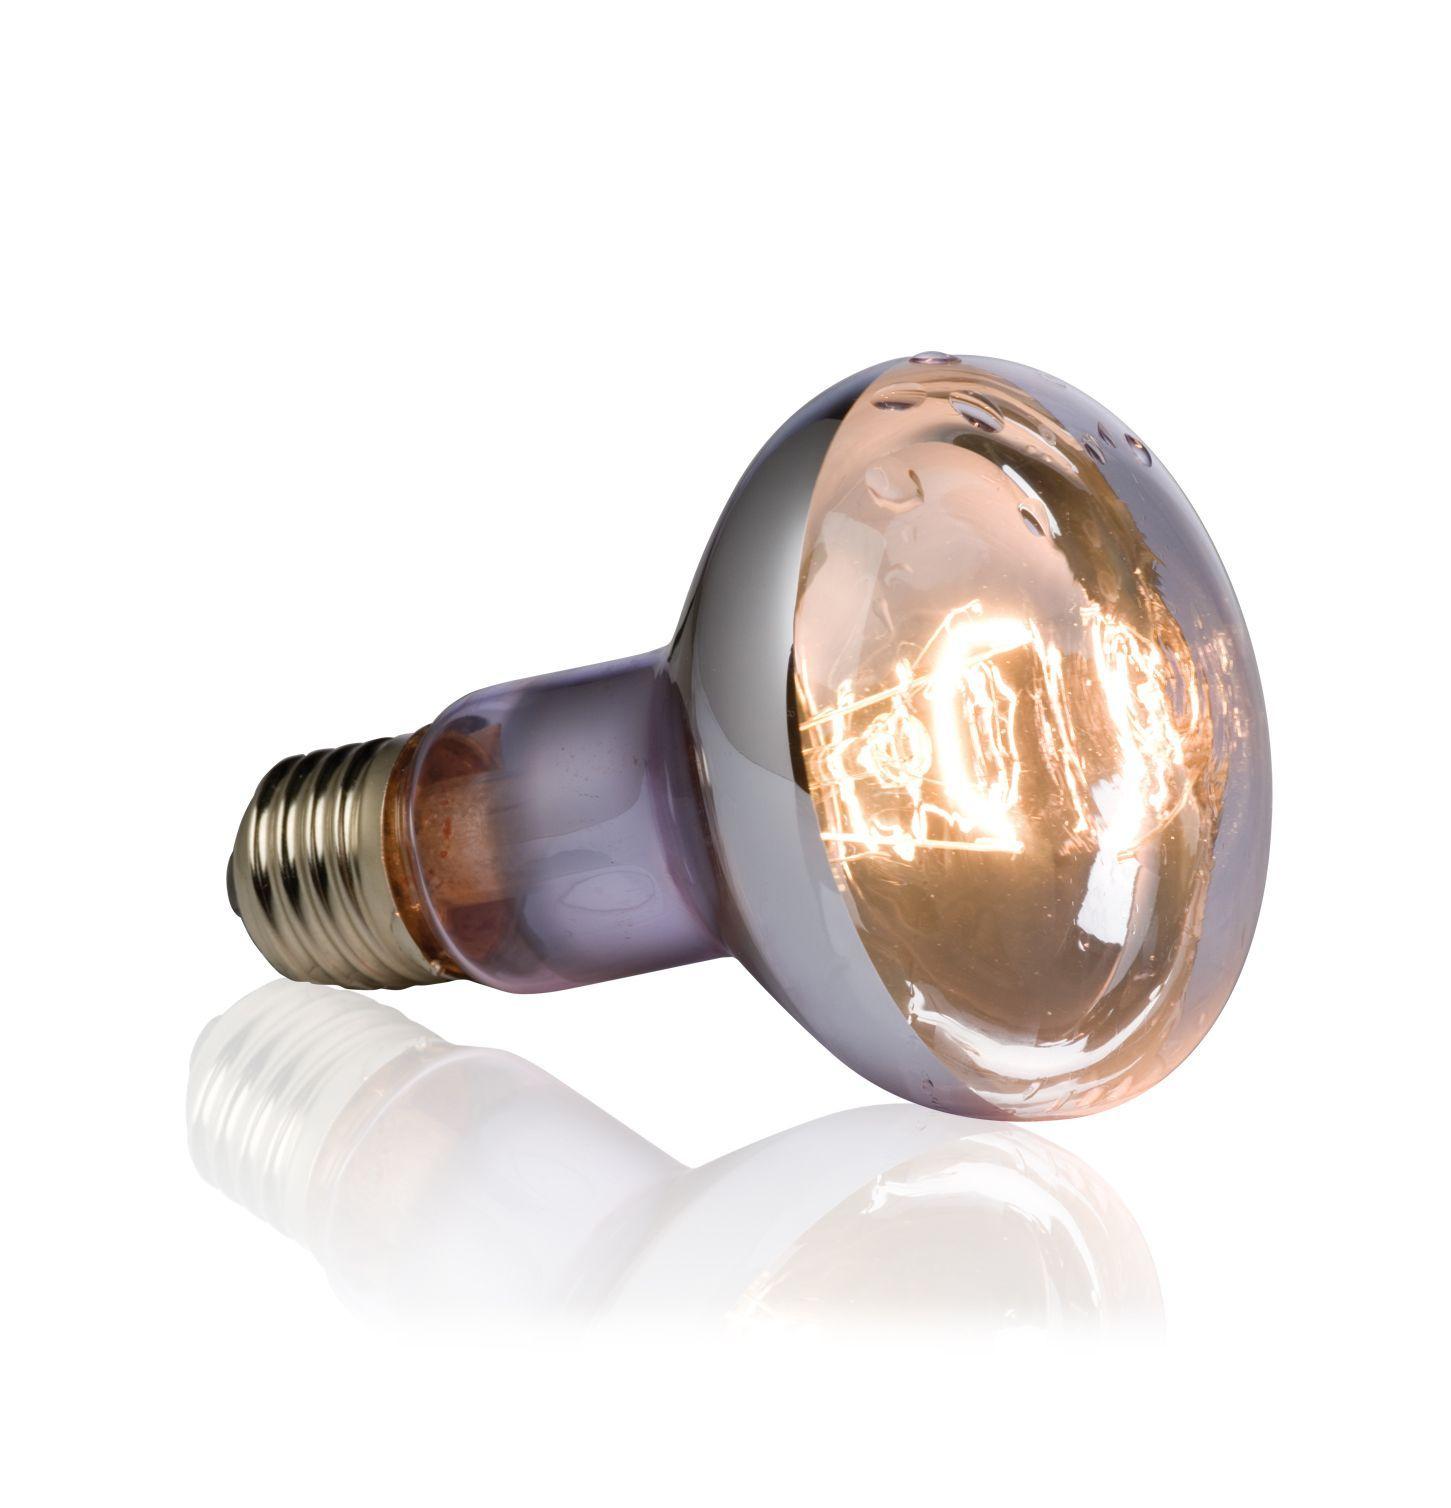 Exo Terra Ampoule Reptile Lampe Basking Lampe Chaleur